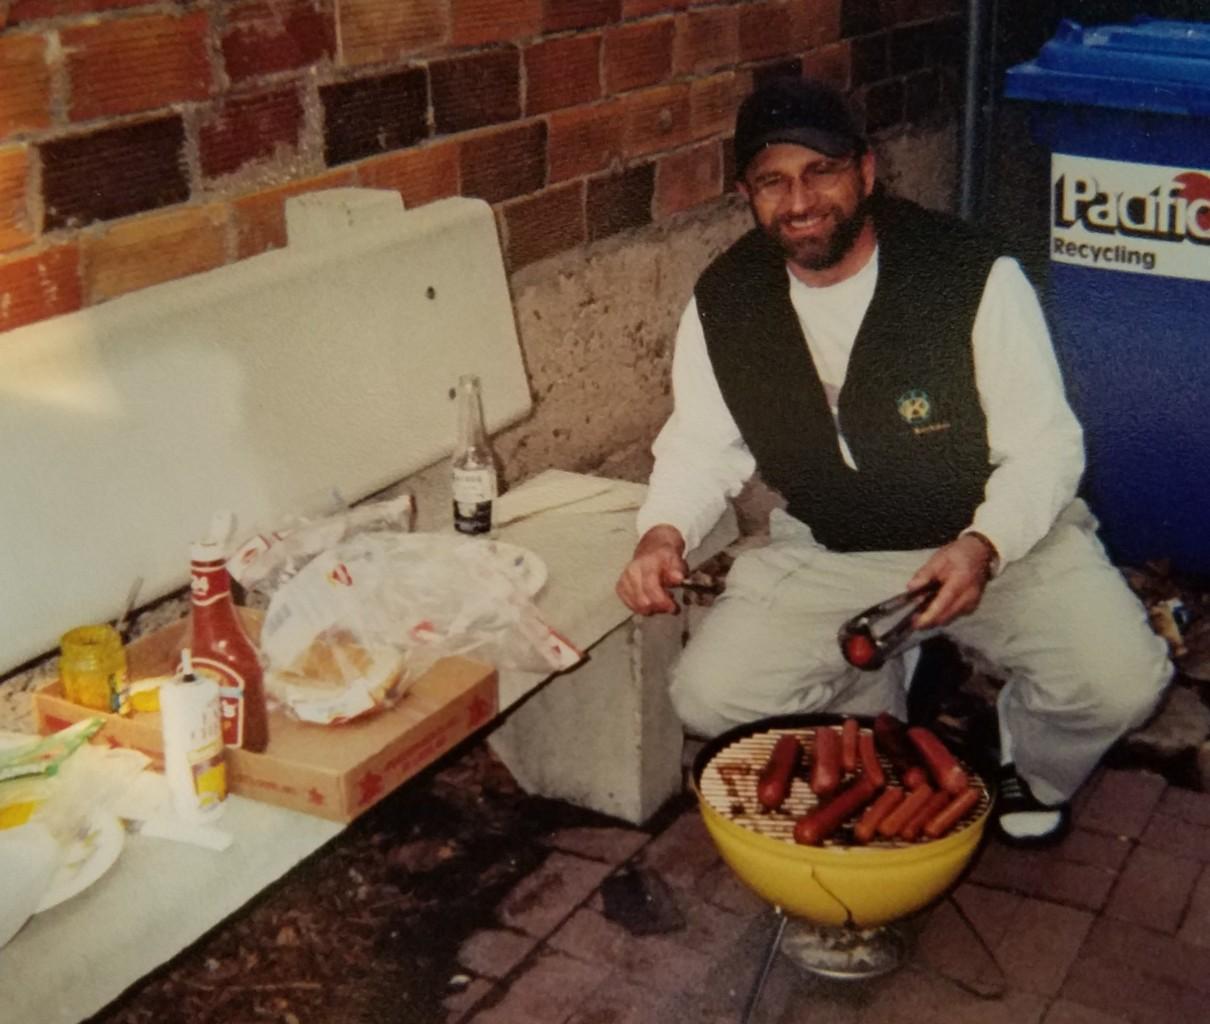 Joe grillmaster